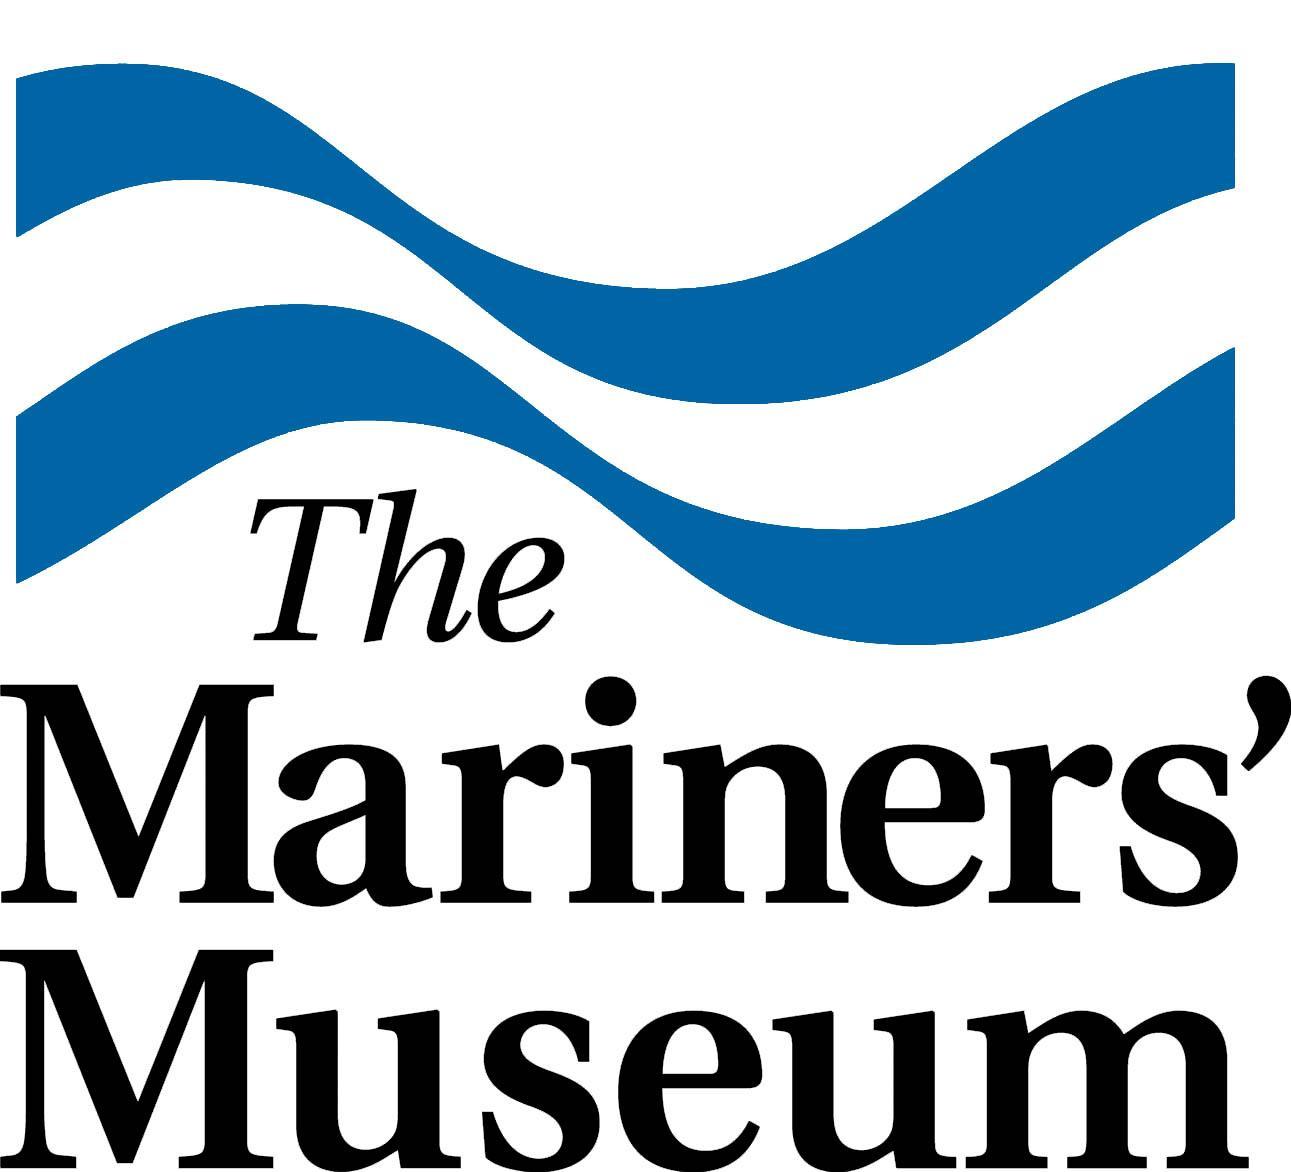 Mariner's Museum2_1541780323614.jpg.jpg